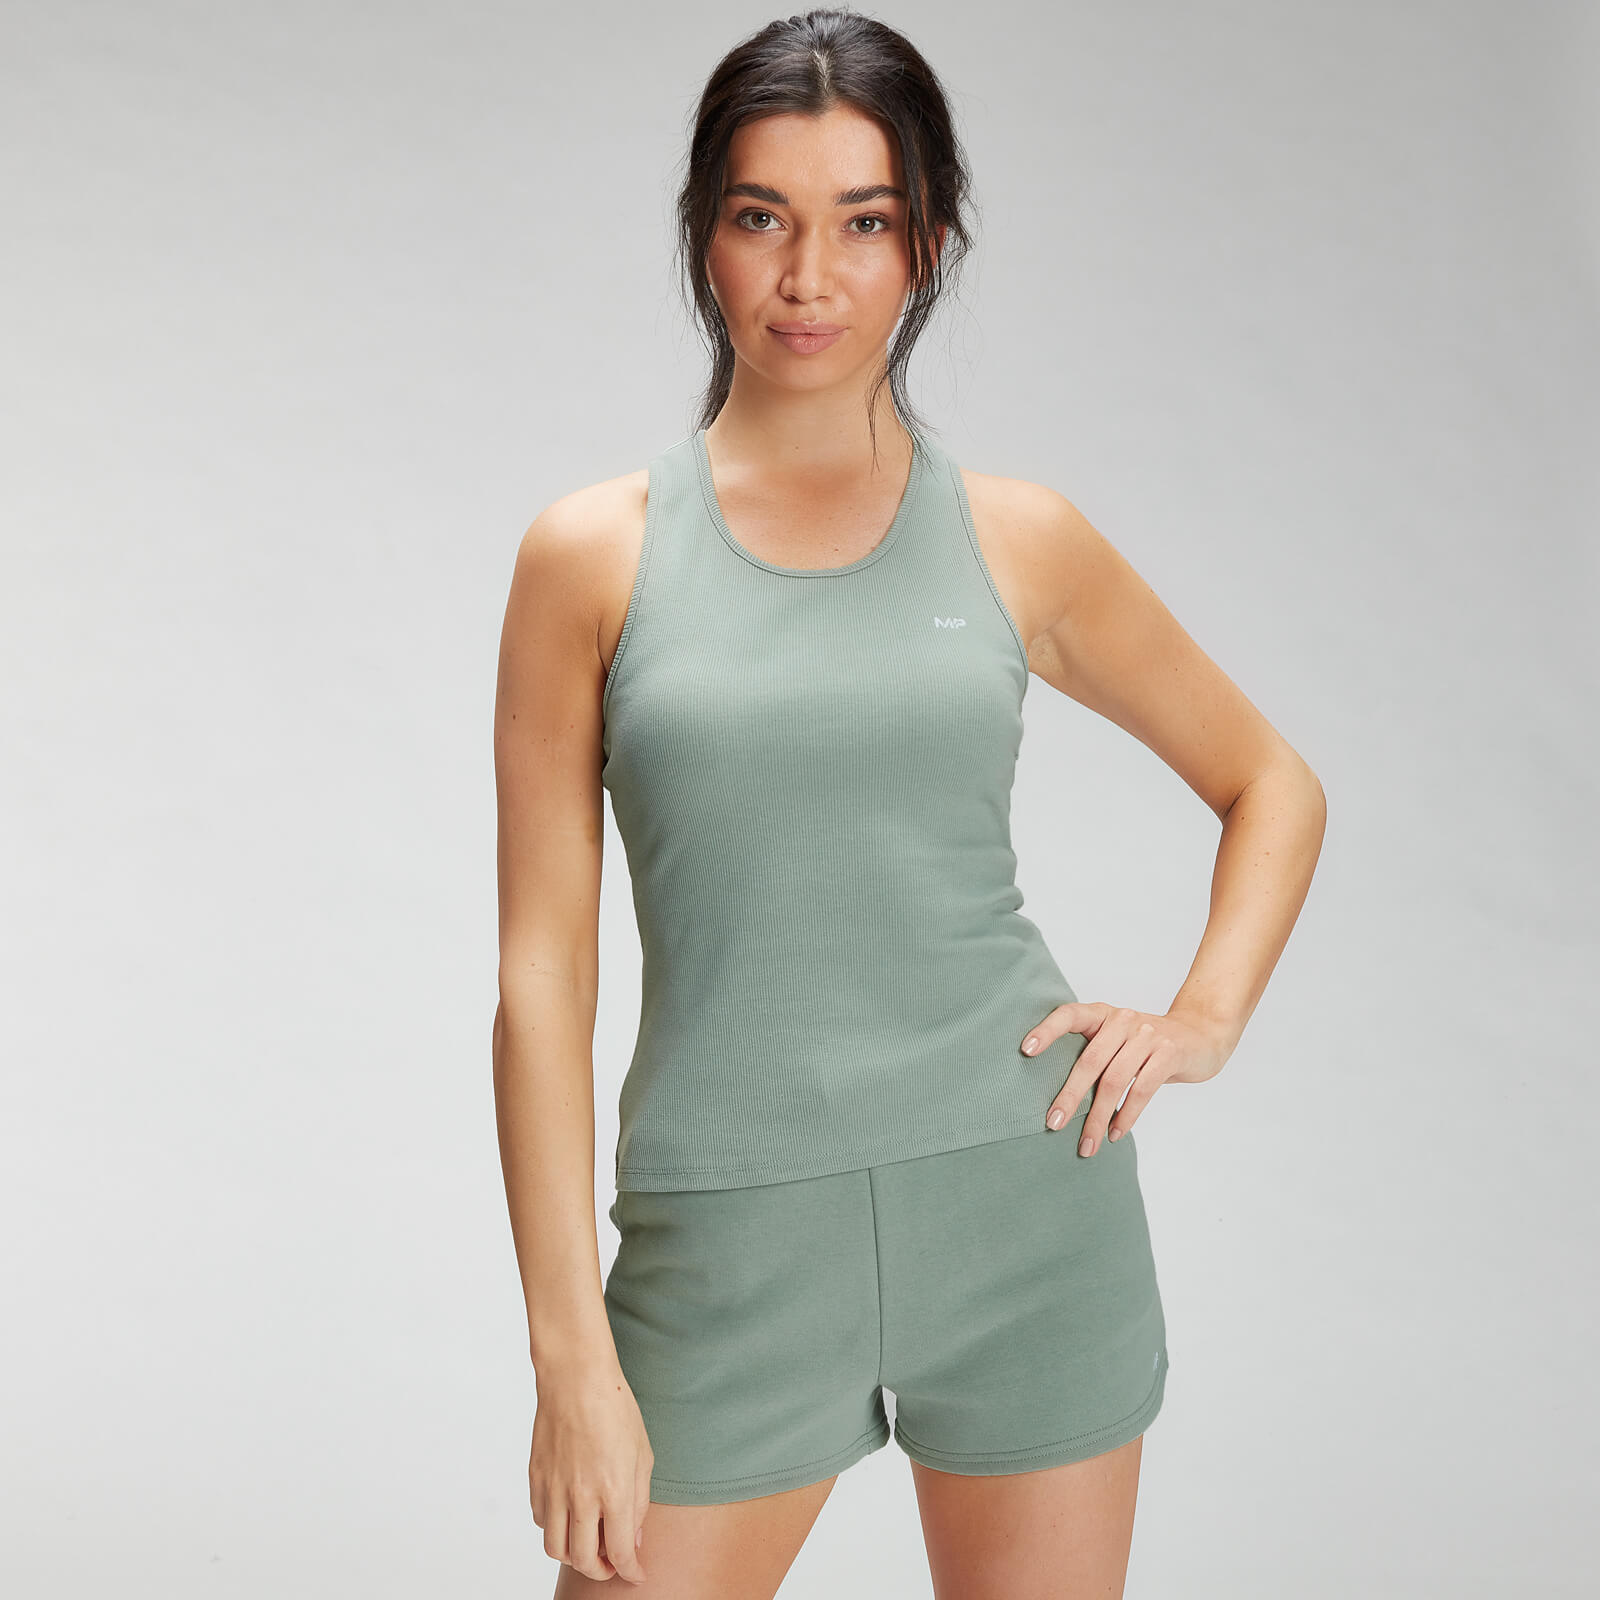 Купить MP Women's Essential Rib Vest - Pale Green - XXL, Myprotein International